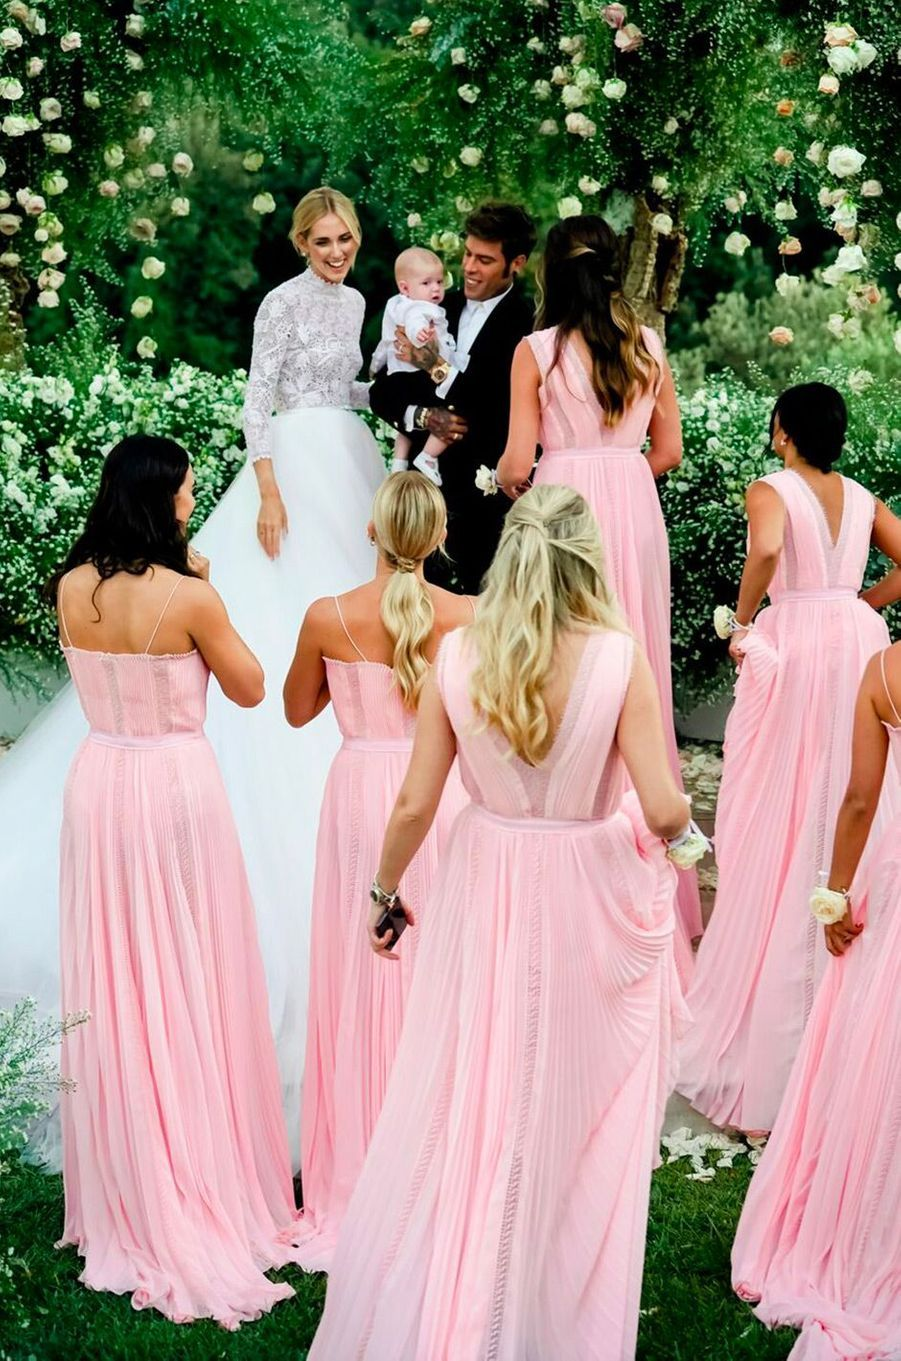 Le mariage de Chiara Ferragni et Federico Leonardo Lucia, aka Fedez, samedi 1er septembre